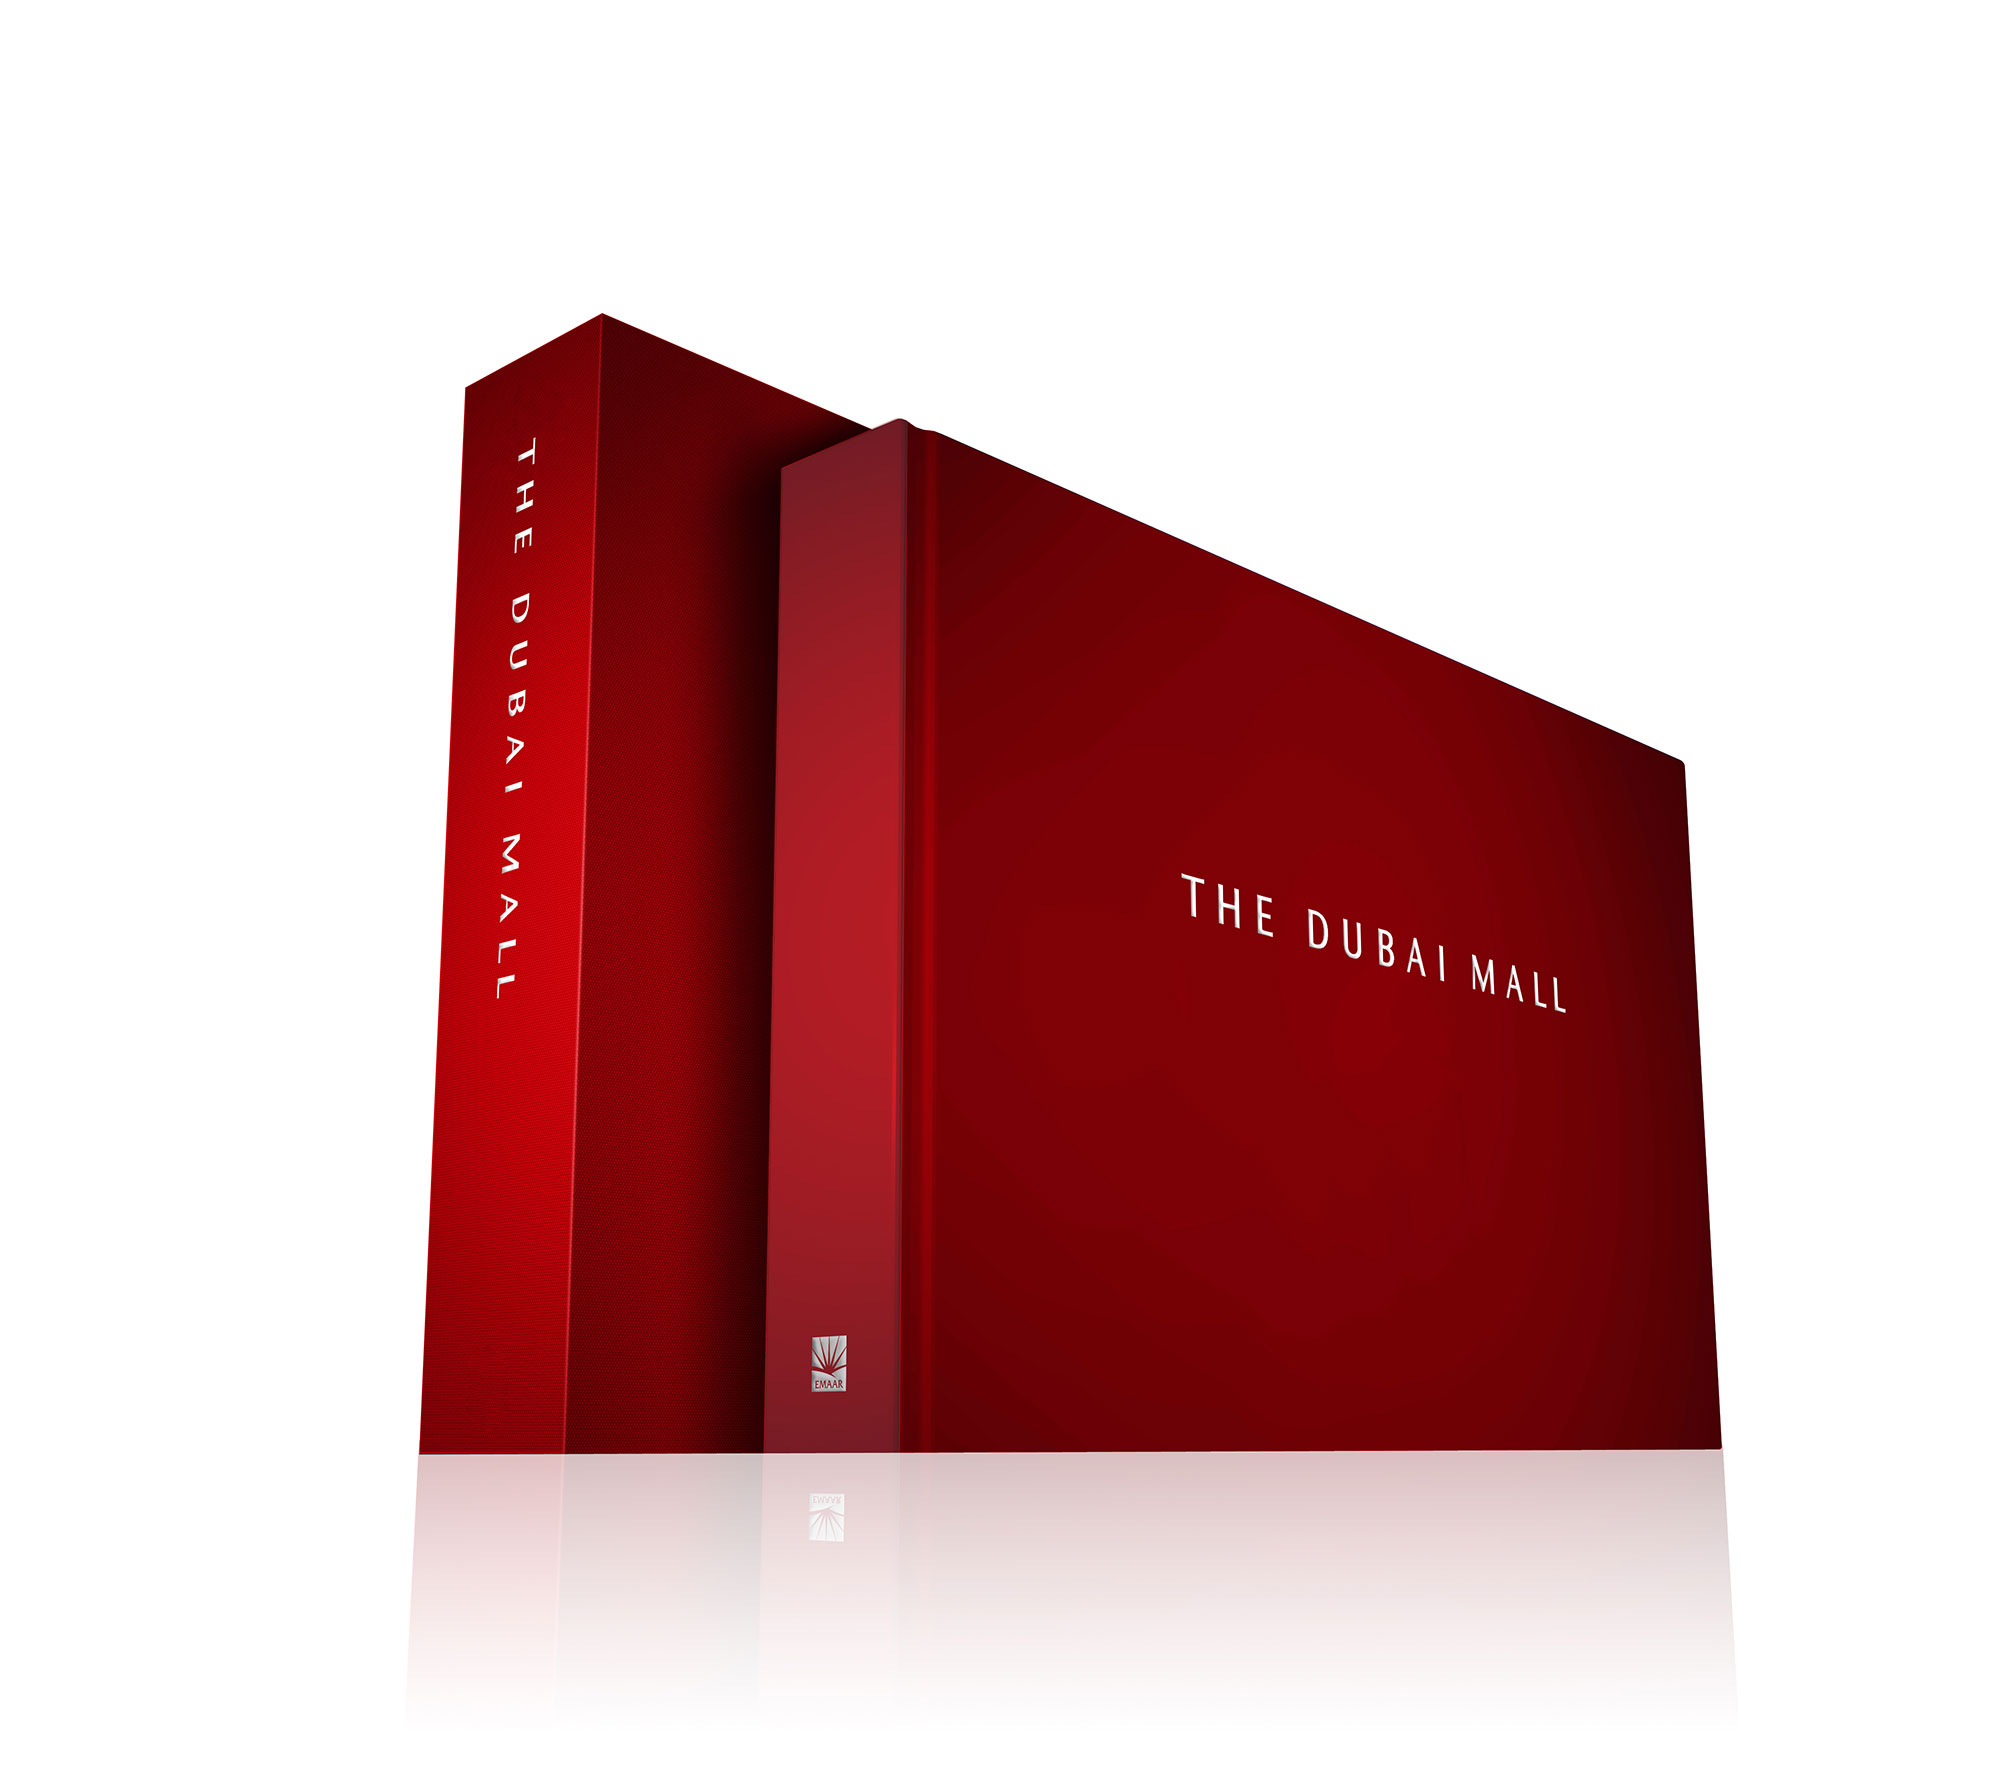 Book and presentation box design by Martin Sully